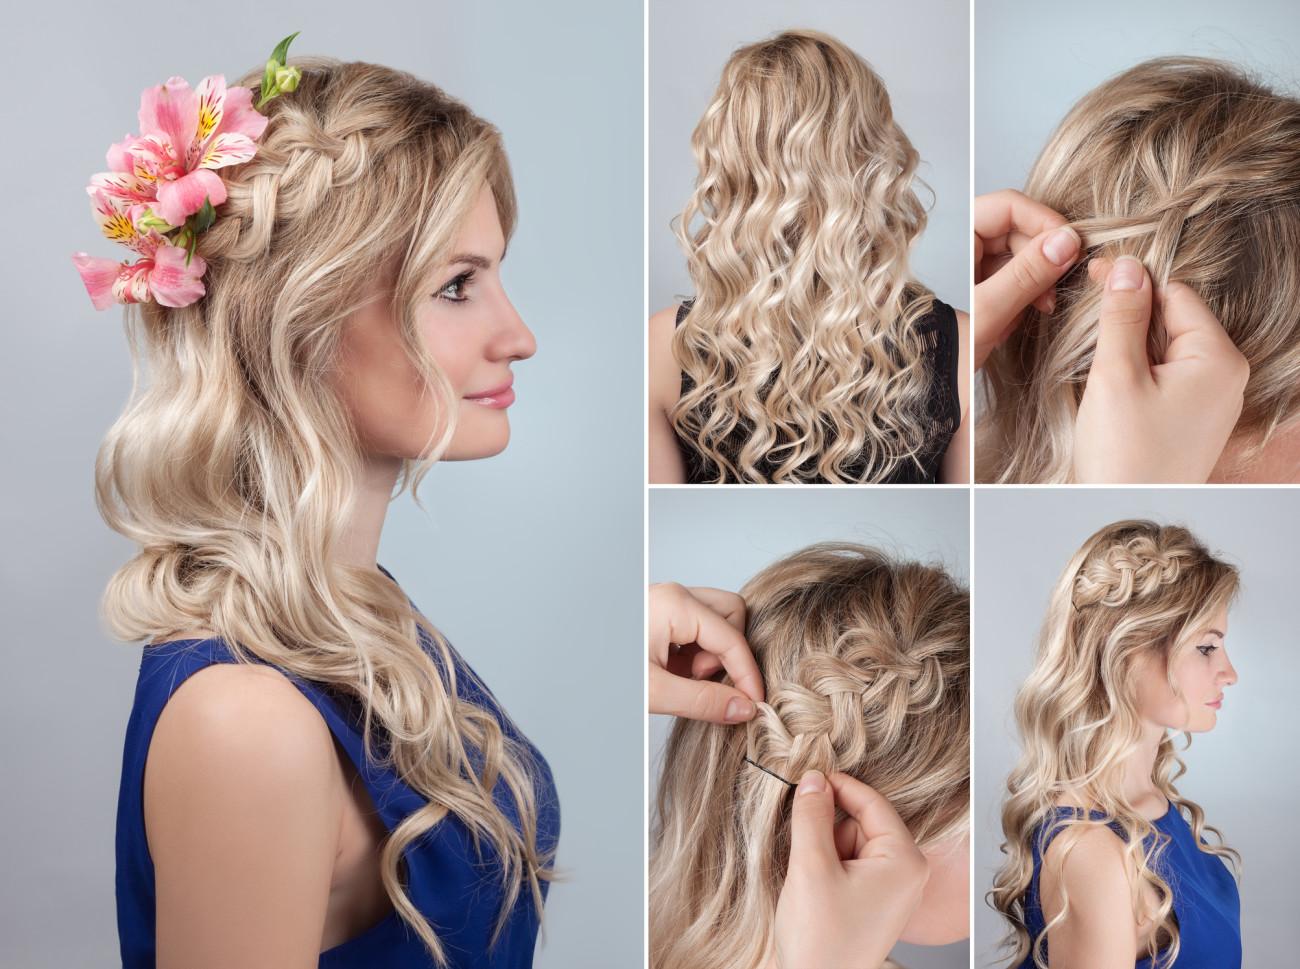 Romantische Frisuren 6 X Bilder & Anleitungen Desired De